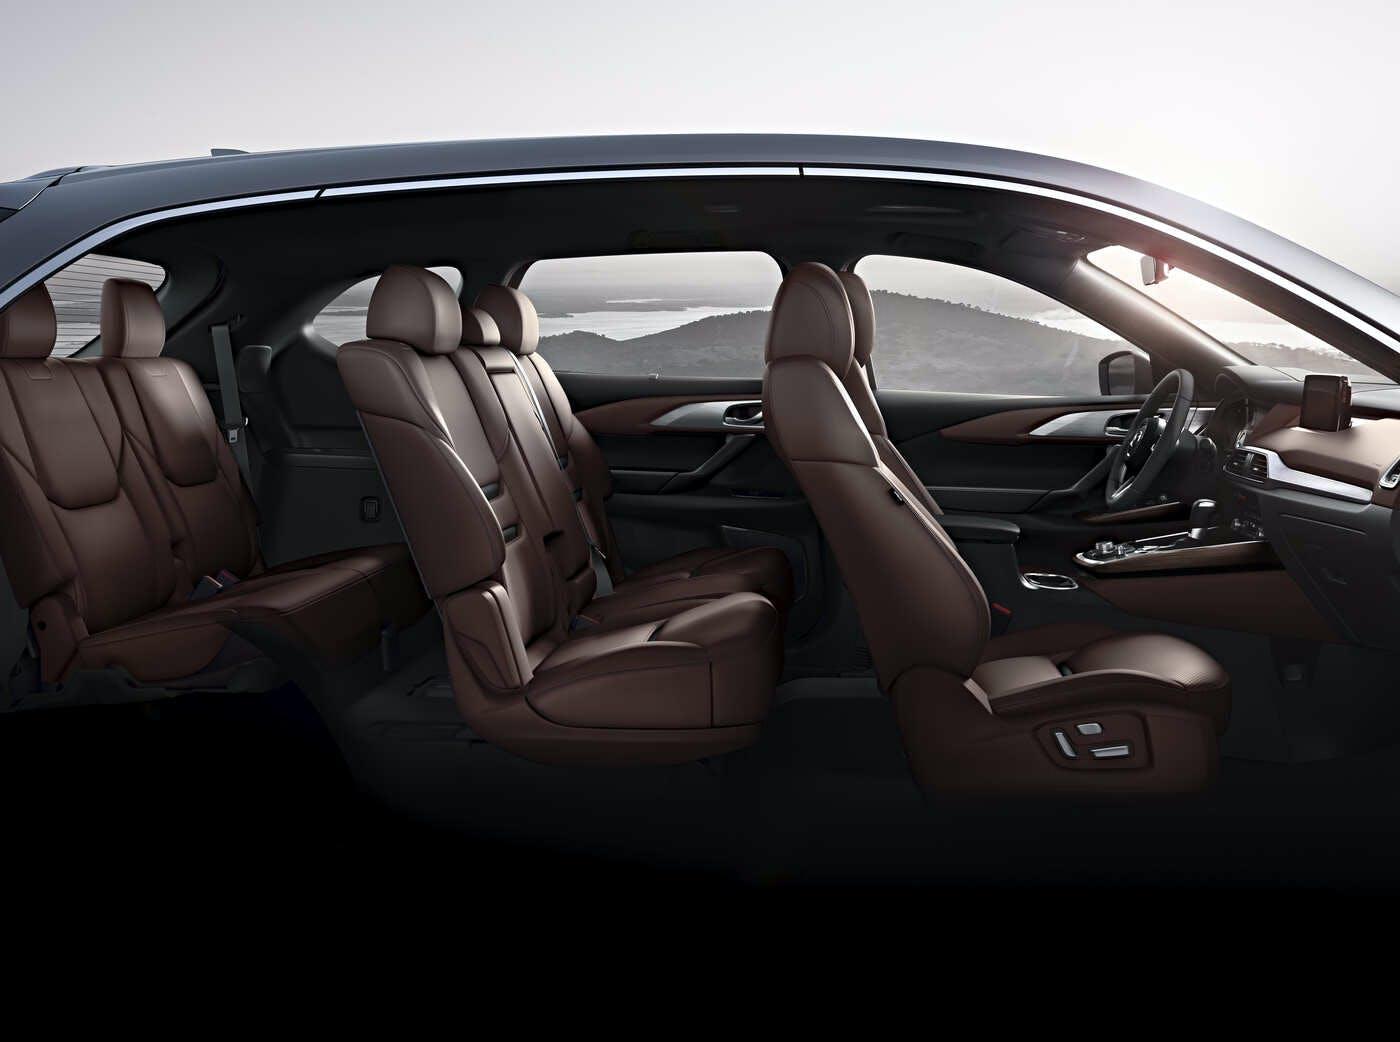 Fabulous 2019 Mazda Cx 9 Comparisons Reviews Pictures Truecar Machost Co Dining Chair Design Ideas Machostcouk